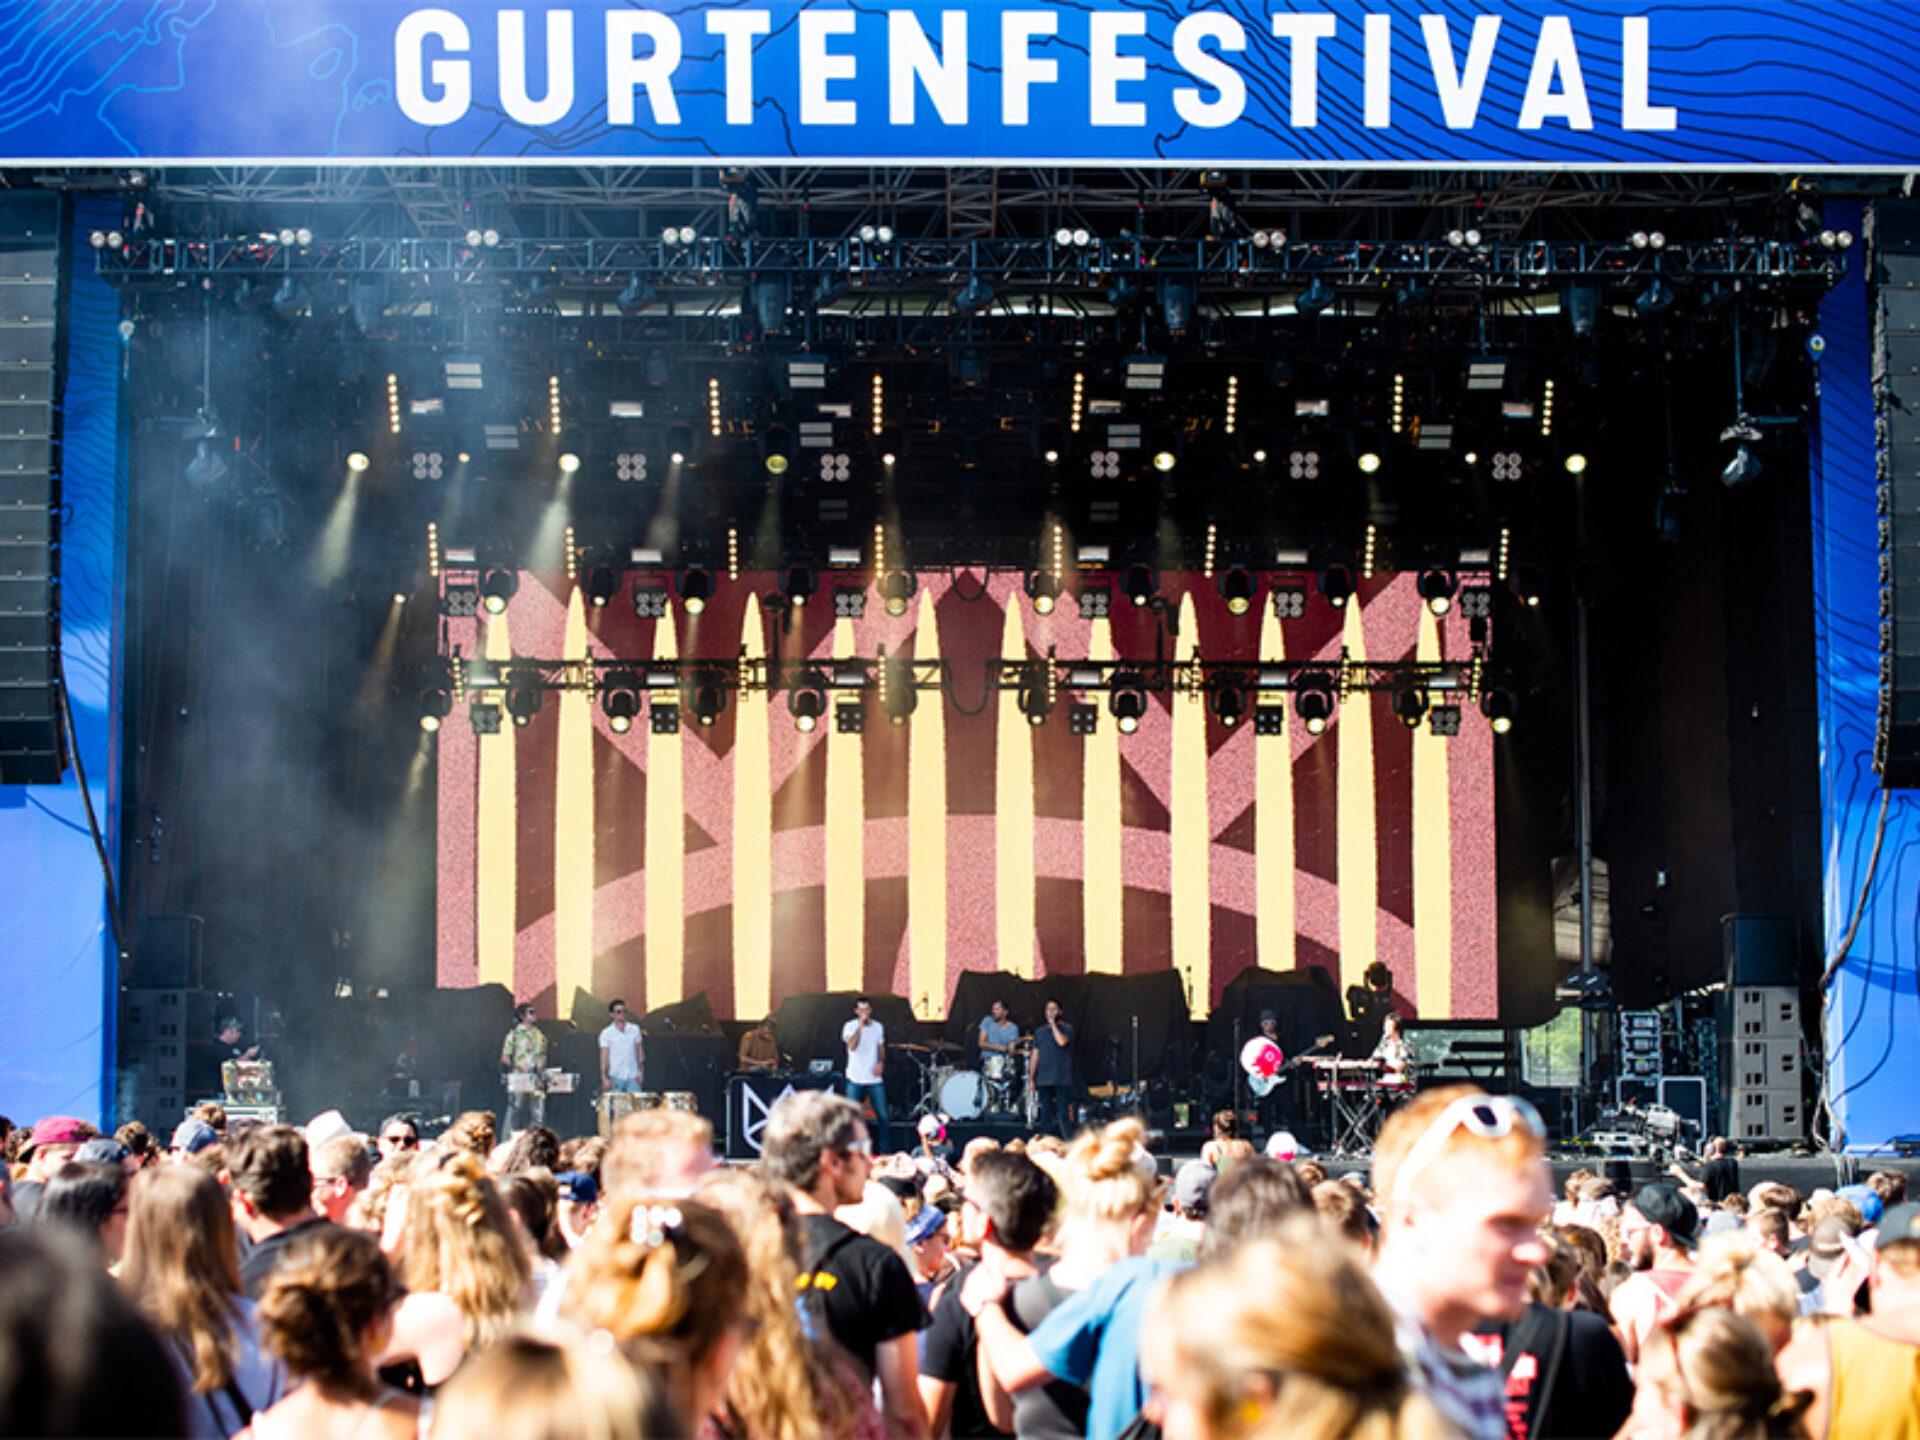 gurtenfestival-bern-merchandising-werbeartikel-mit-logo-bedruckt